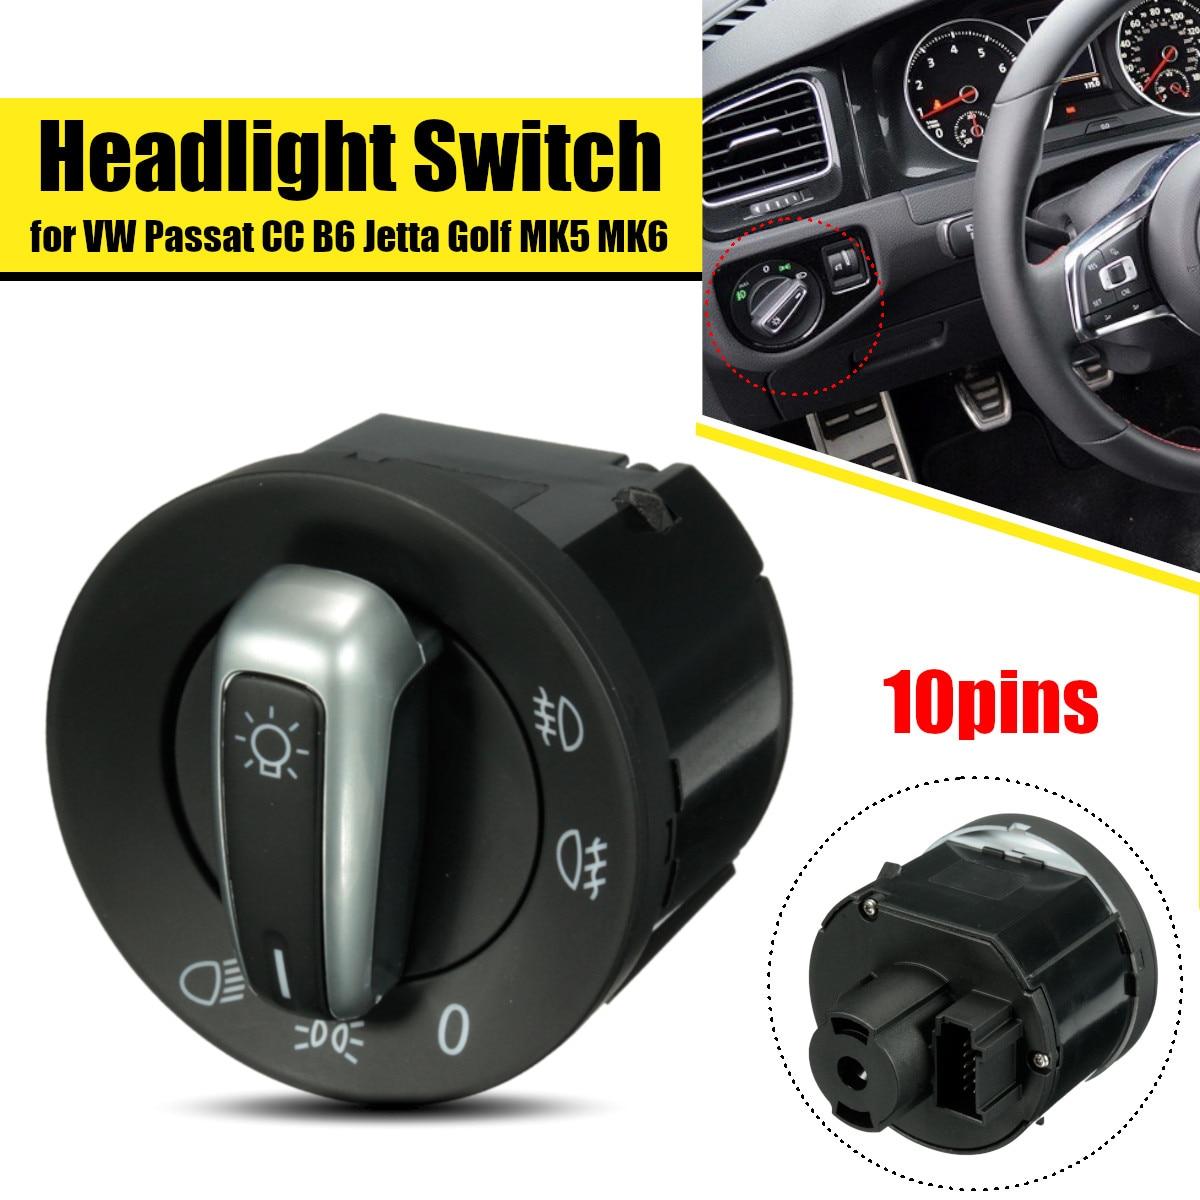 Interruptor del faro del coche interruptor de la lámpara antiniebla 5ND941431A para VW Golf/Jetta 5 6 GTI MK5 MK6/Passat b6 Touran Tiguan